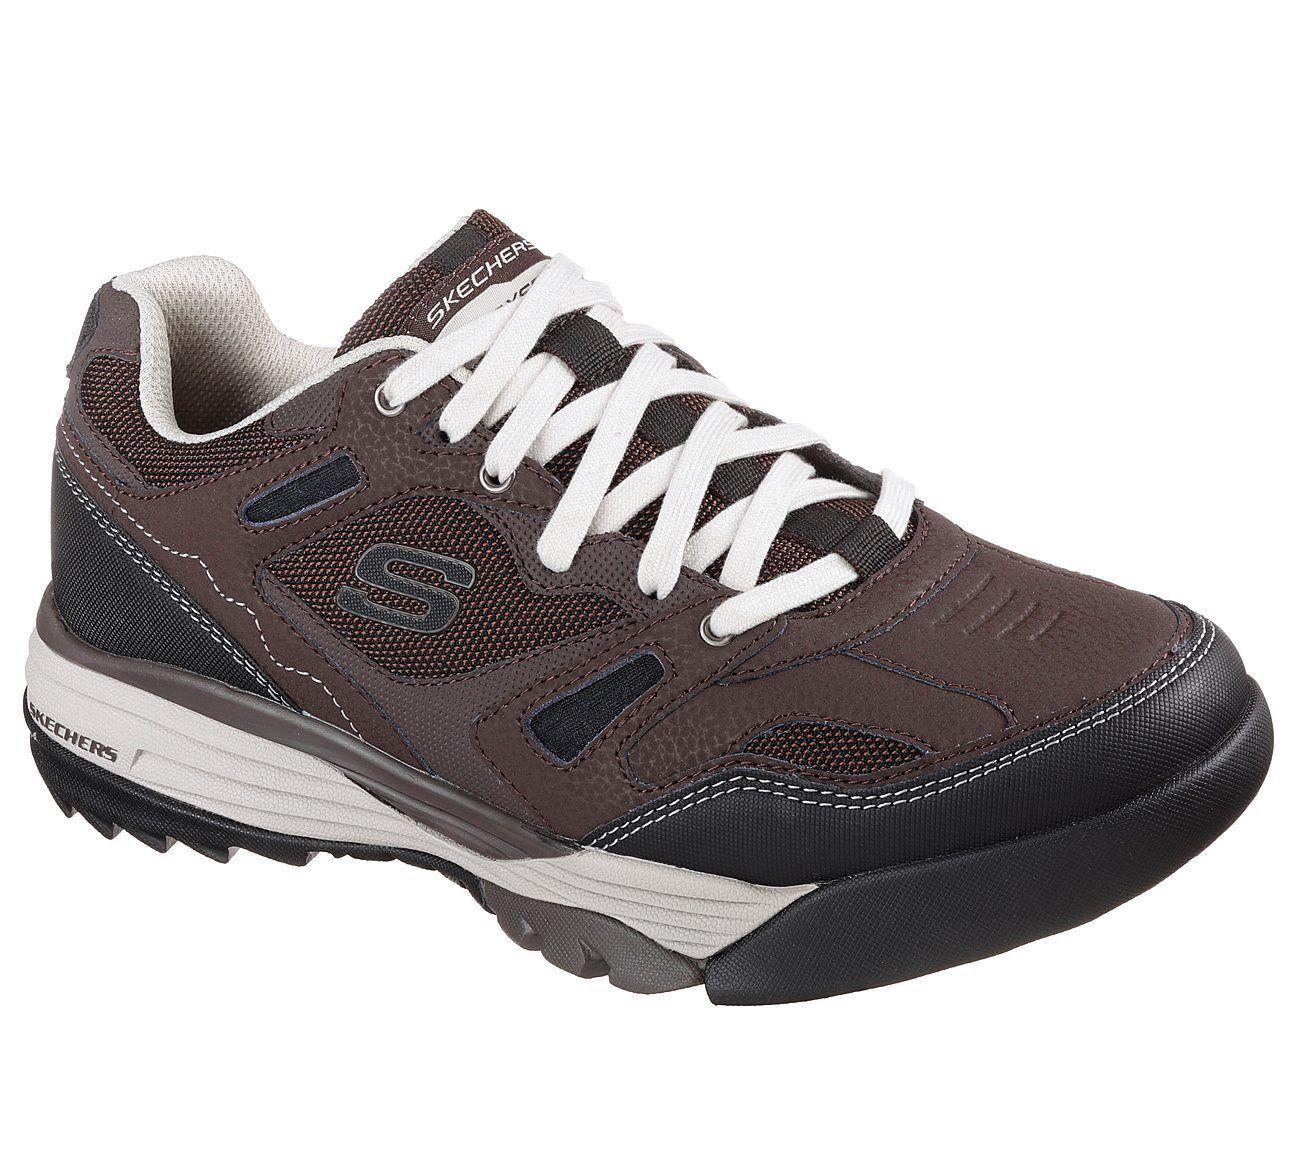 51800 Brown Skechers shoes Men Memory Foam Sport Train Comfort Casual Trail Hike